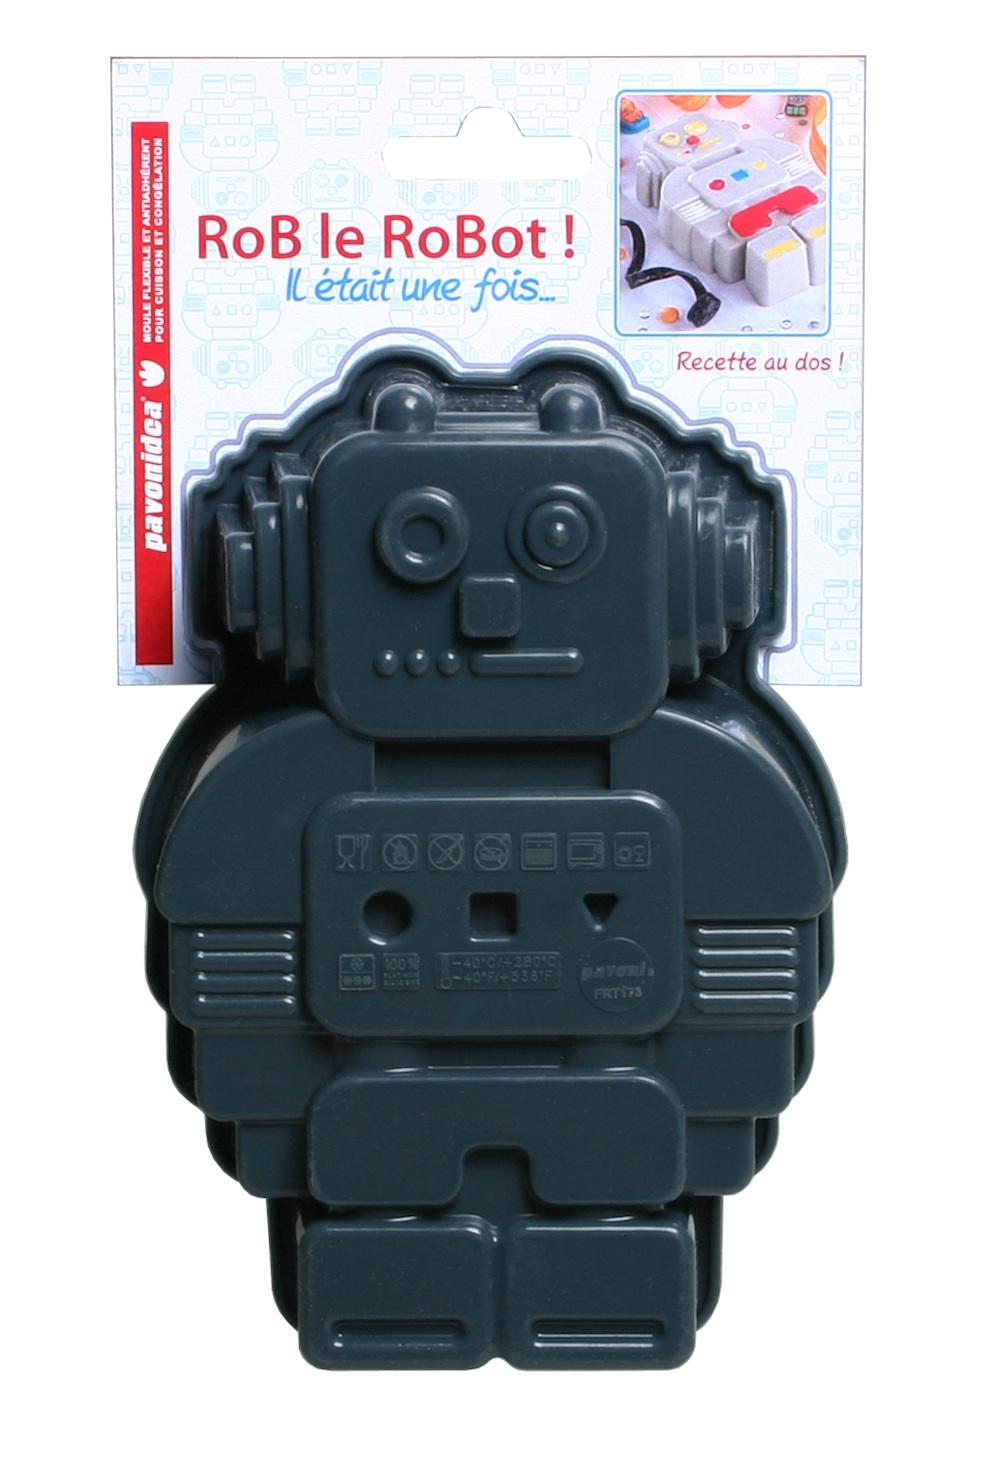 Mle pavo robot rob pack copie